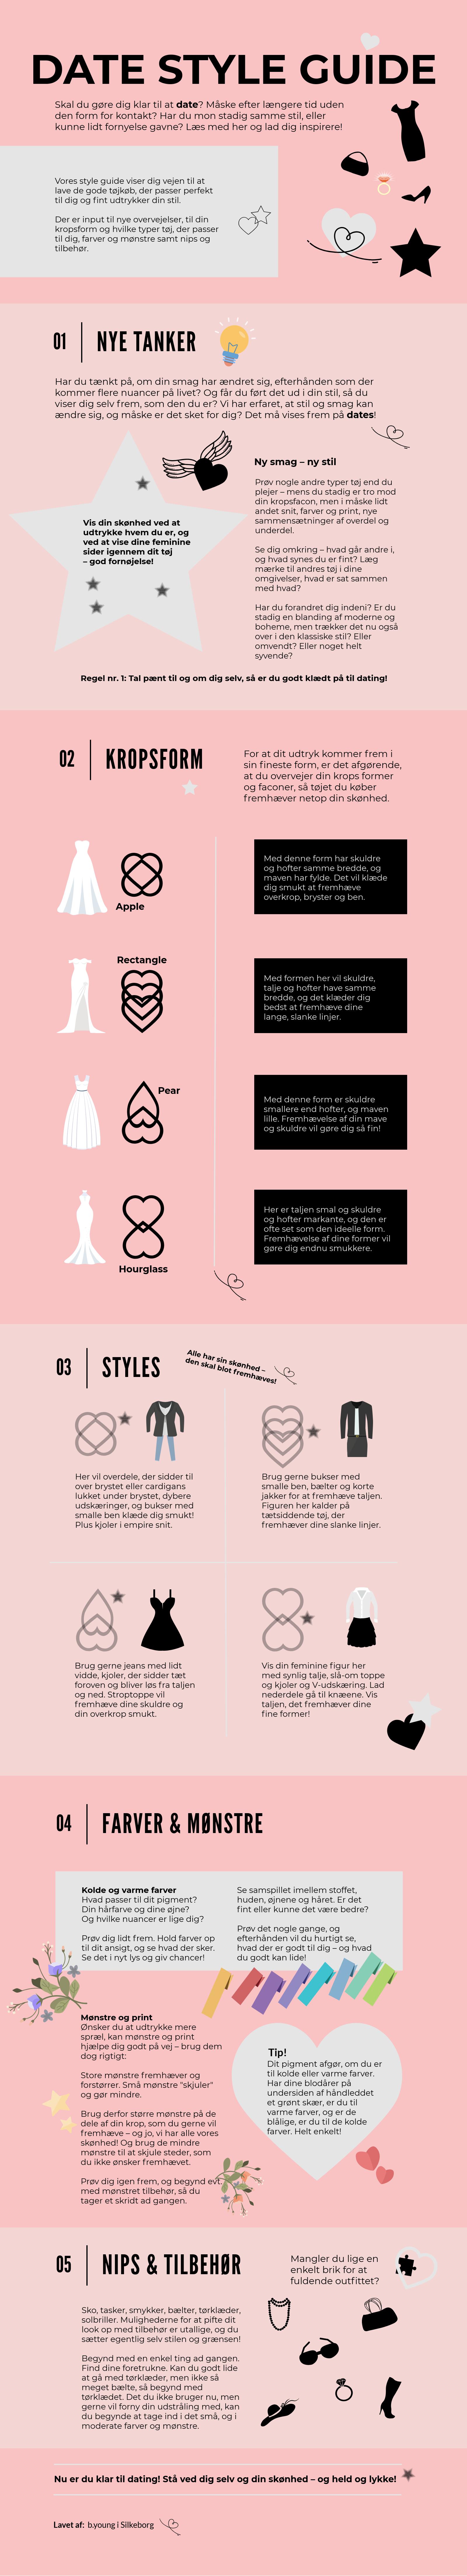 Style guide til dating